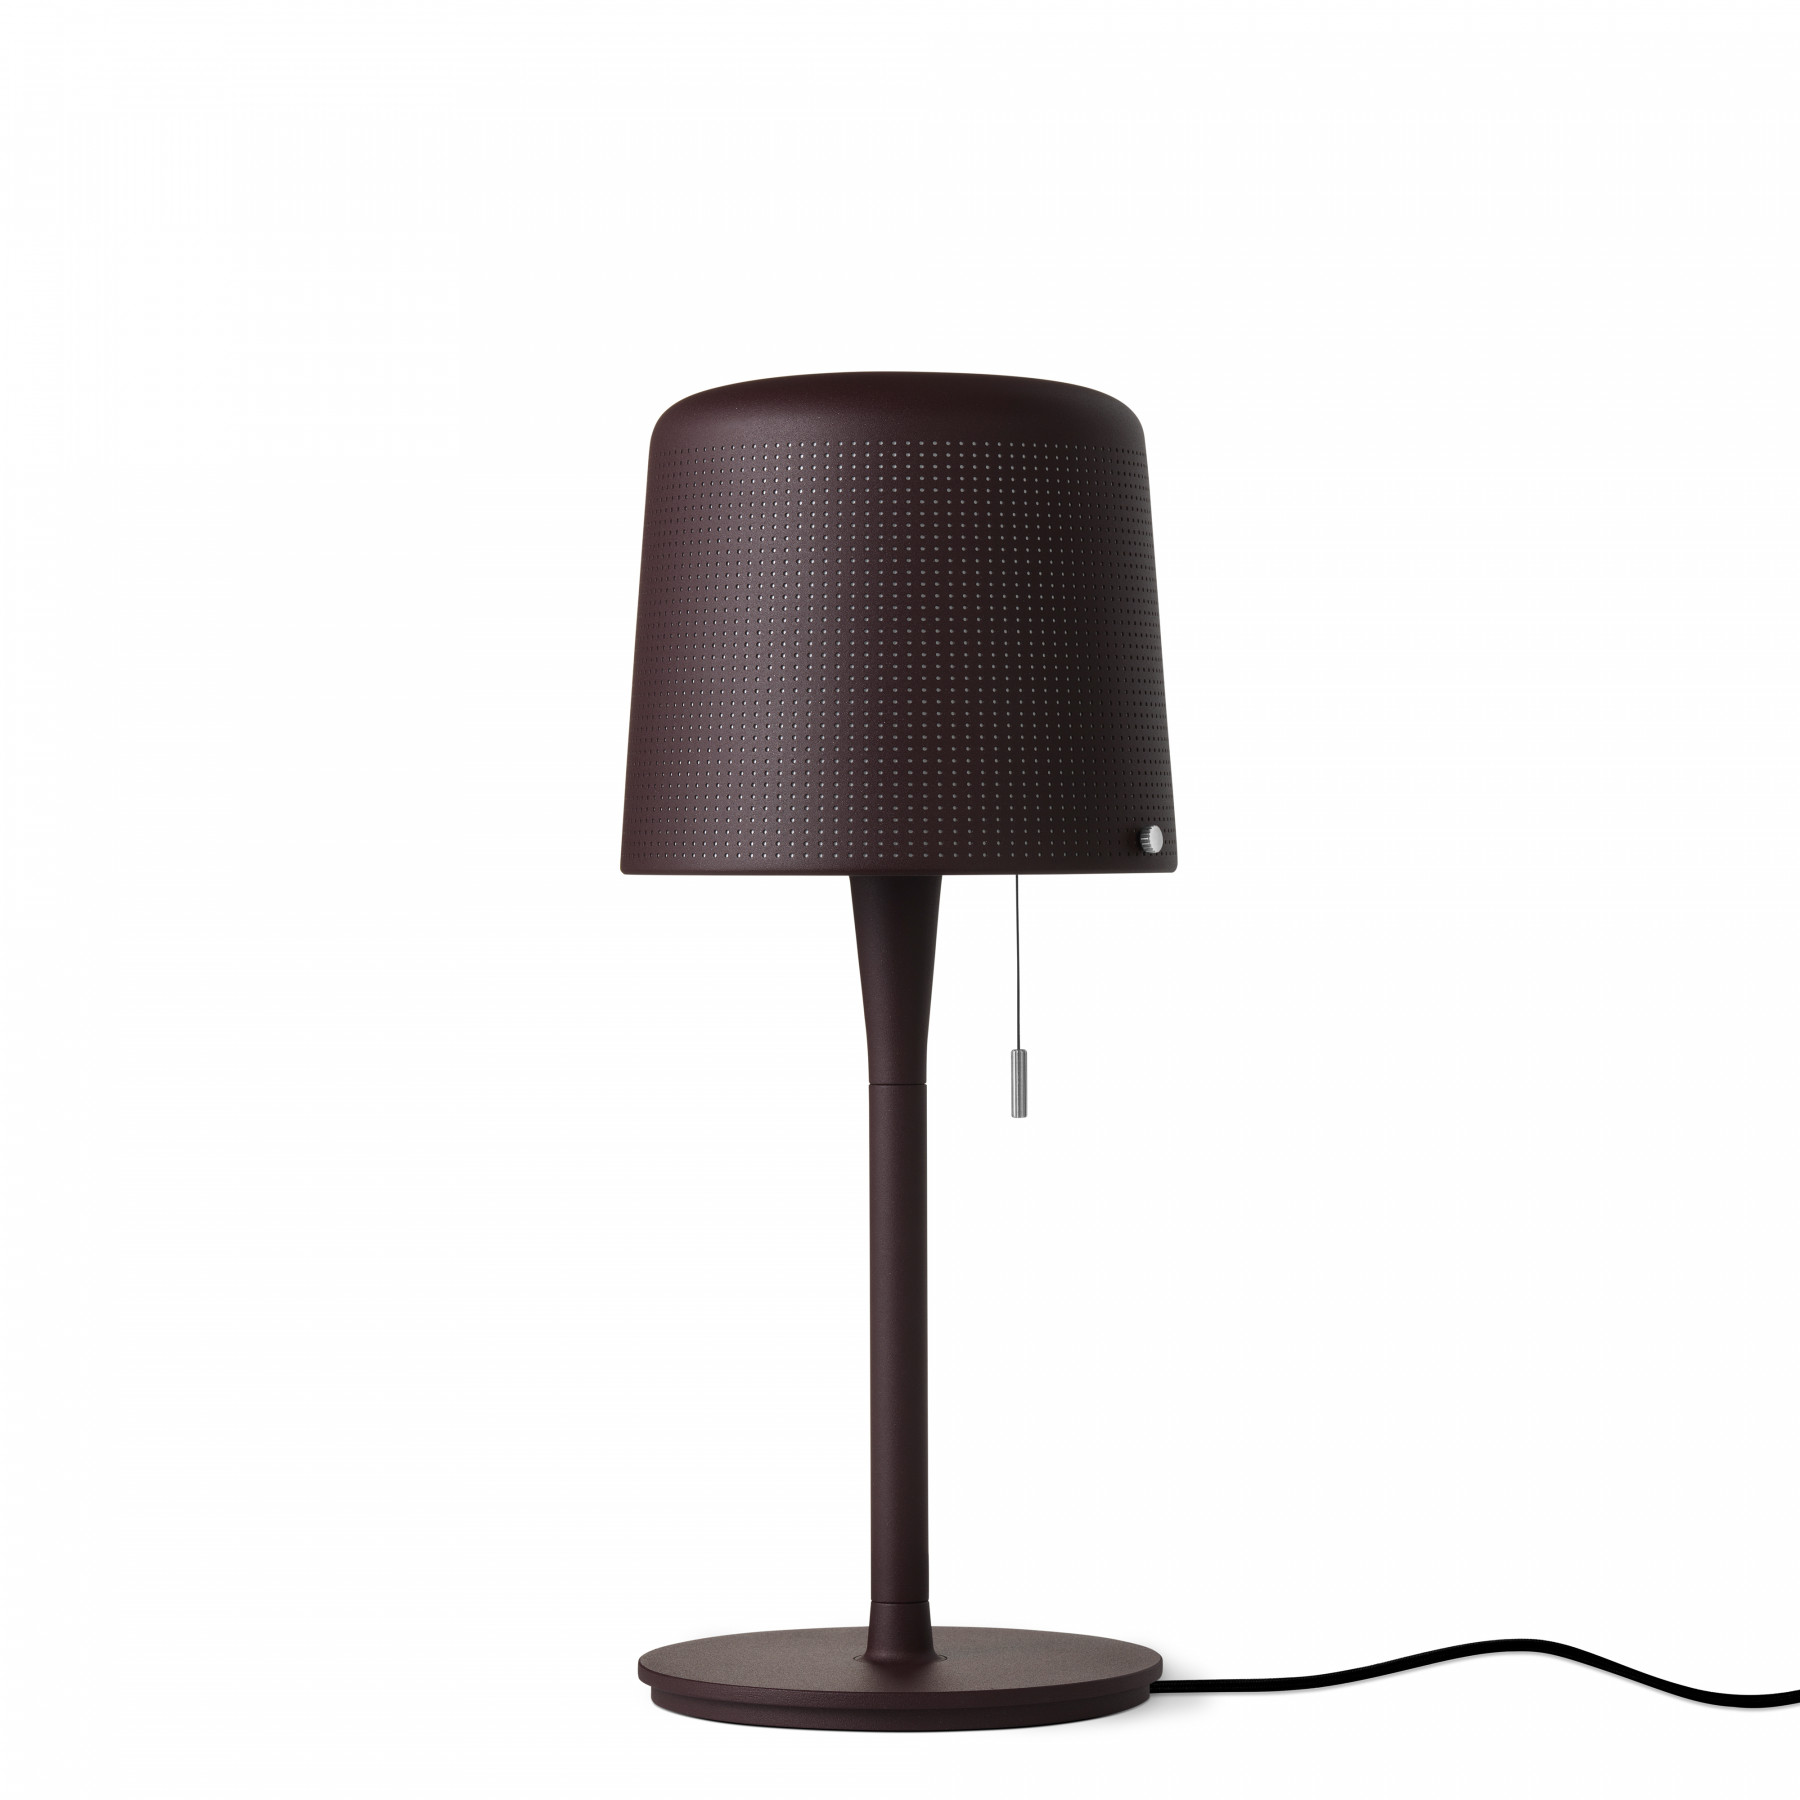 vipp Table Lamp Burgundy VIPP530, 53080EU, 5705953168313